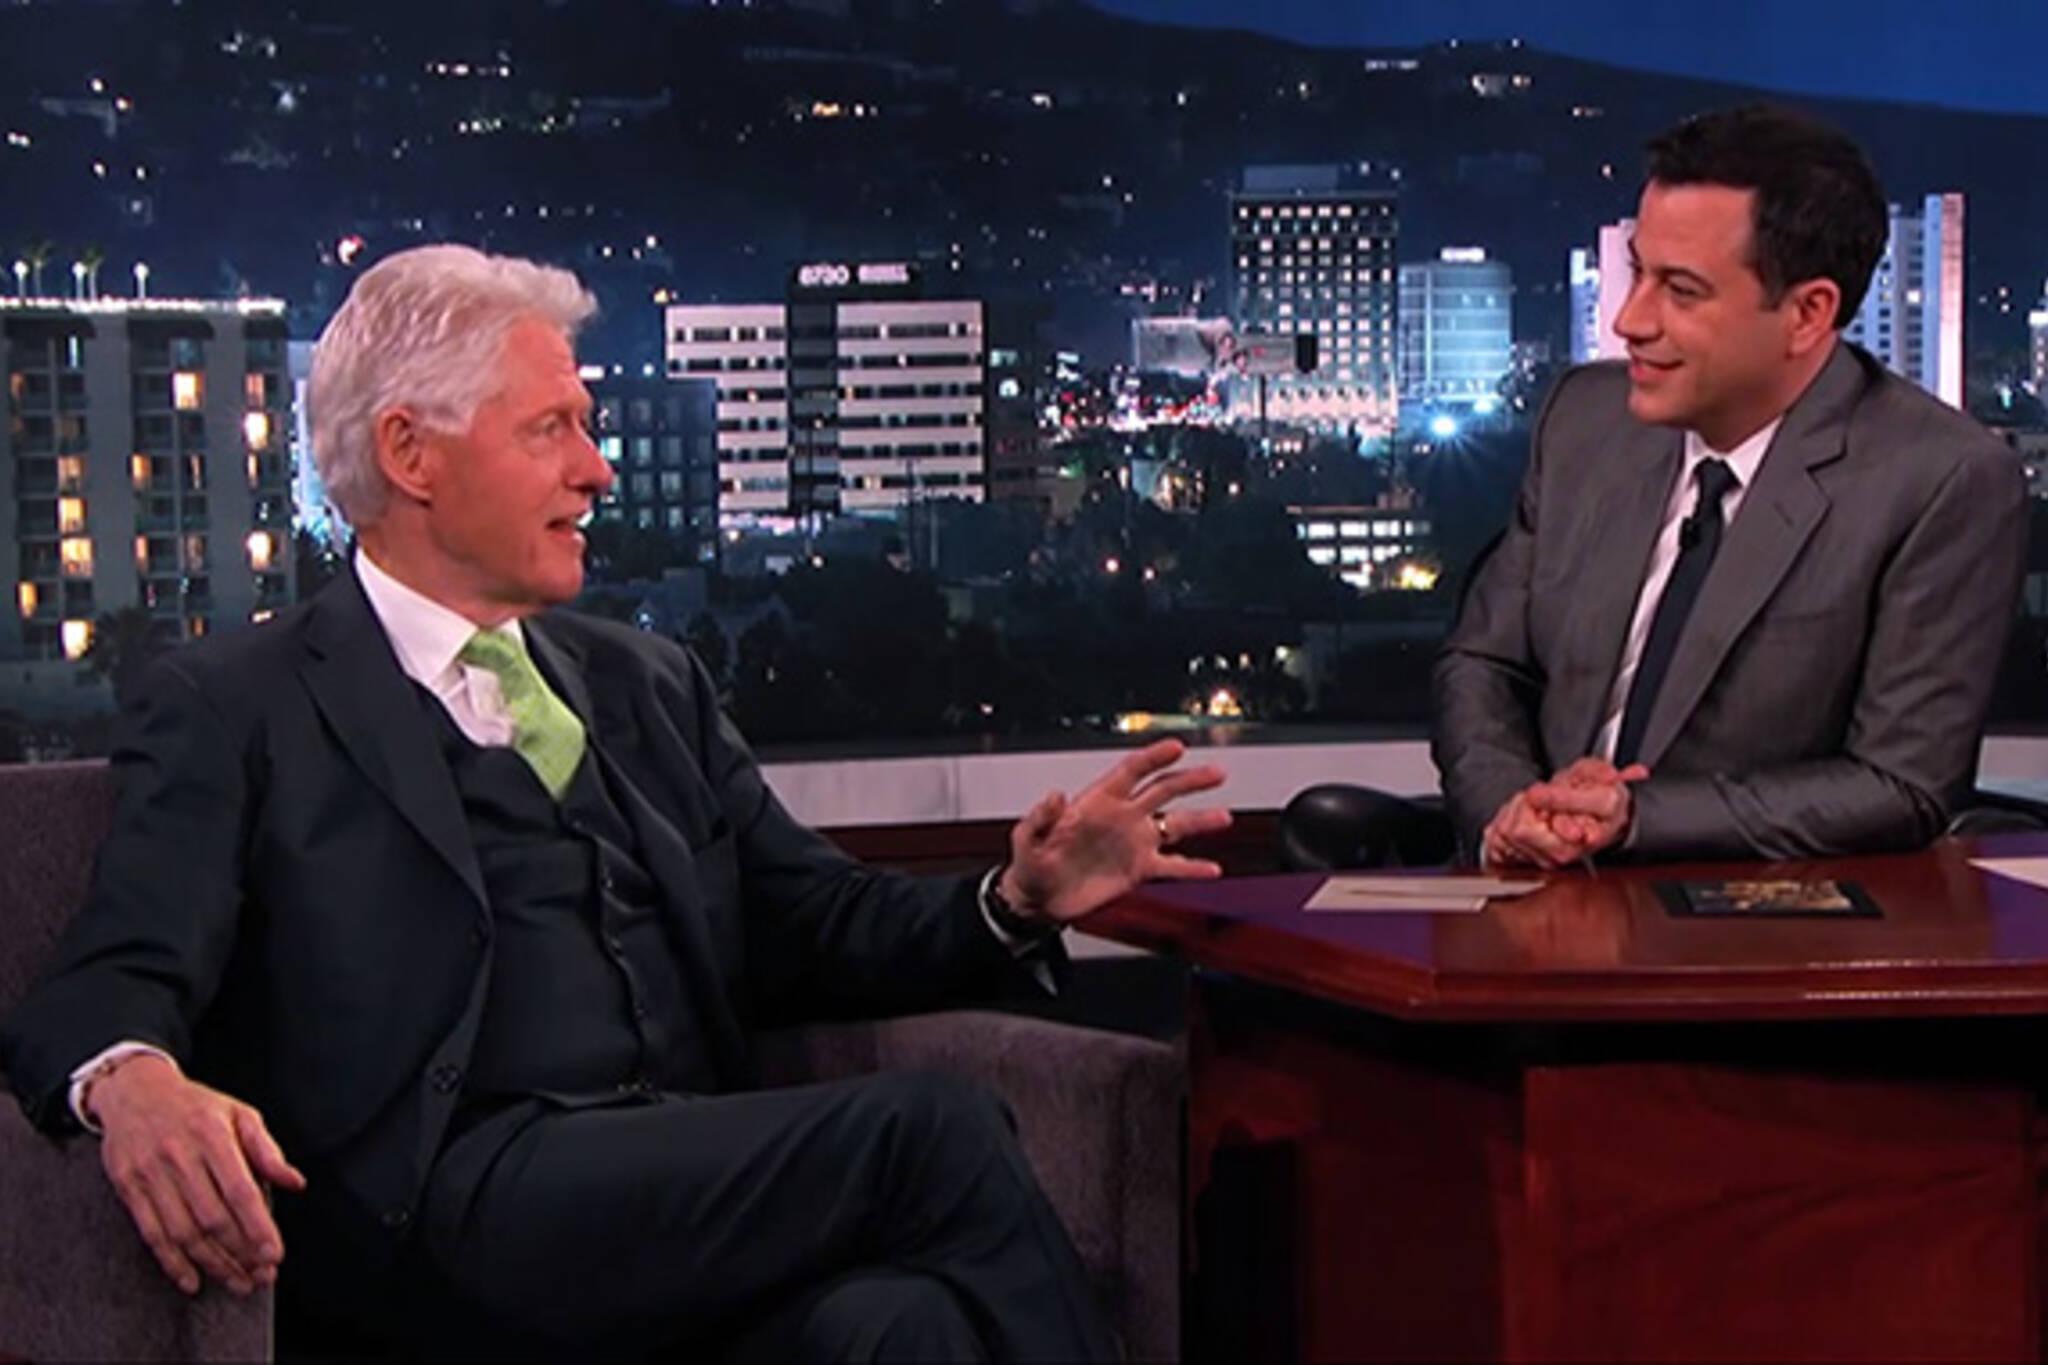 Bill Clinton Rob Ford